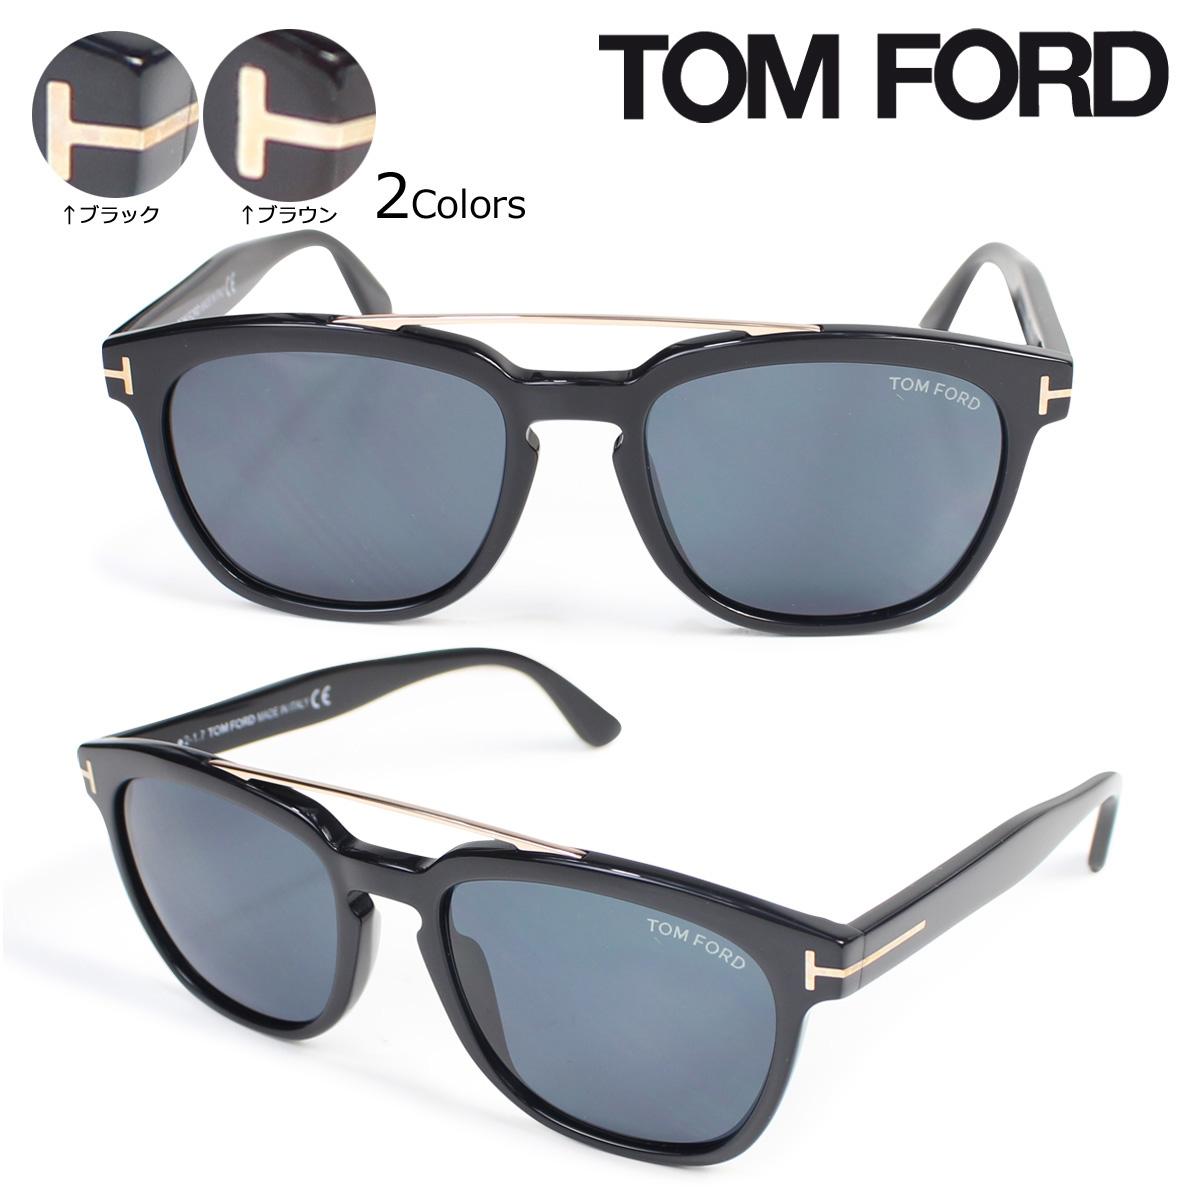 567d143a5bb97 Sugar Online Shop  Tom Ford TOM FORD sunglasses glasses men gap Dis ...